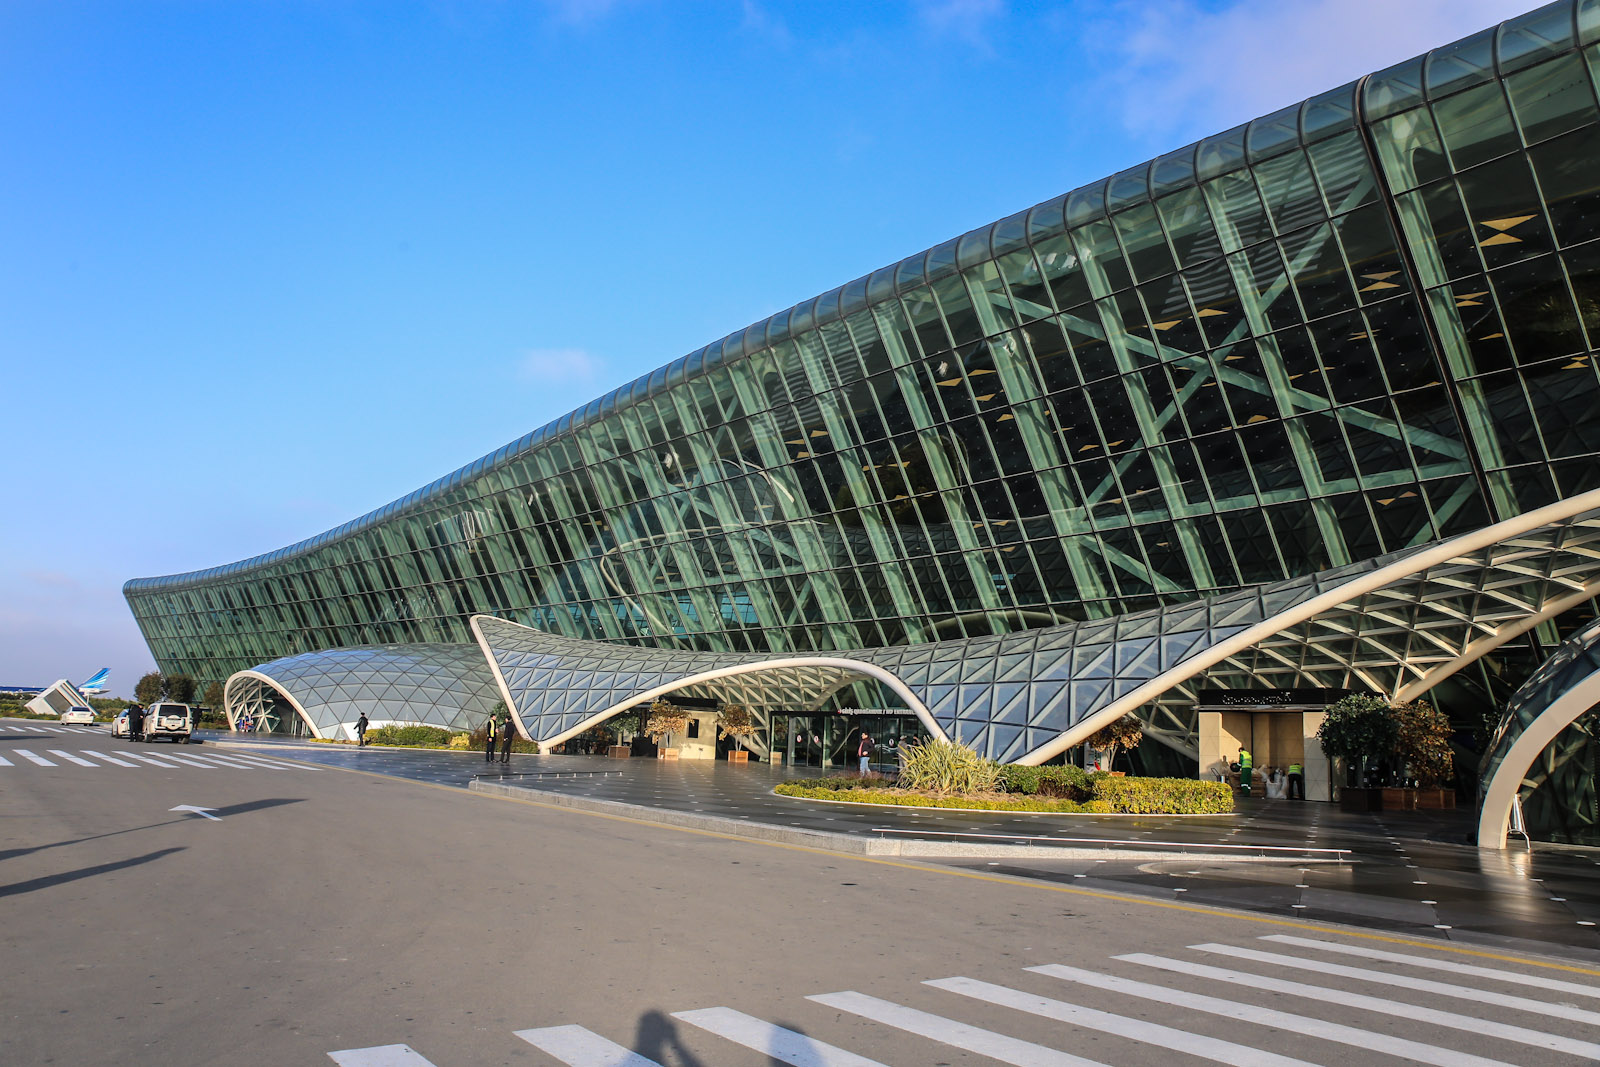 У входа в терминал 1 аэропорта Баку